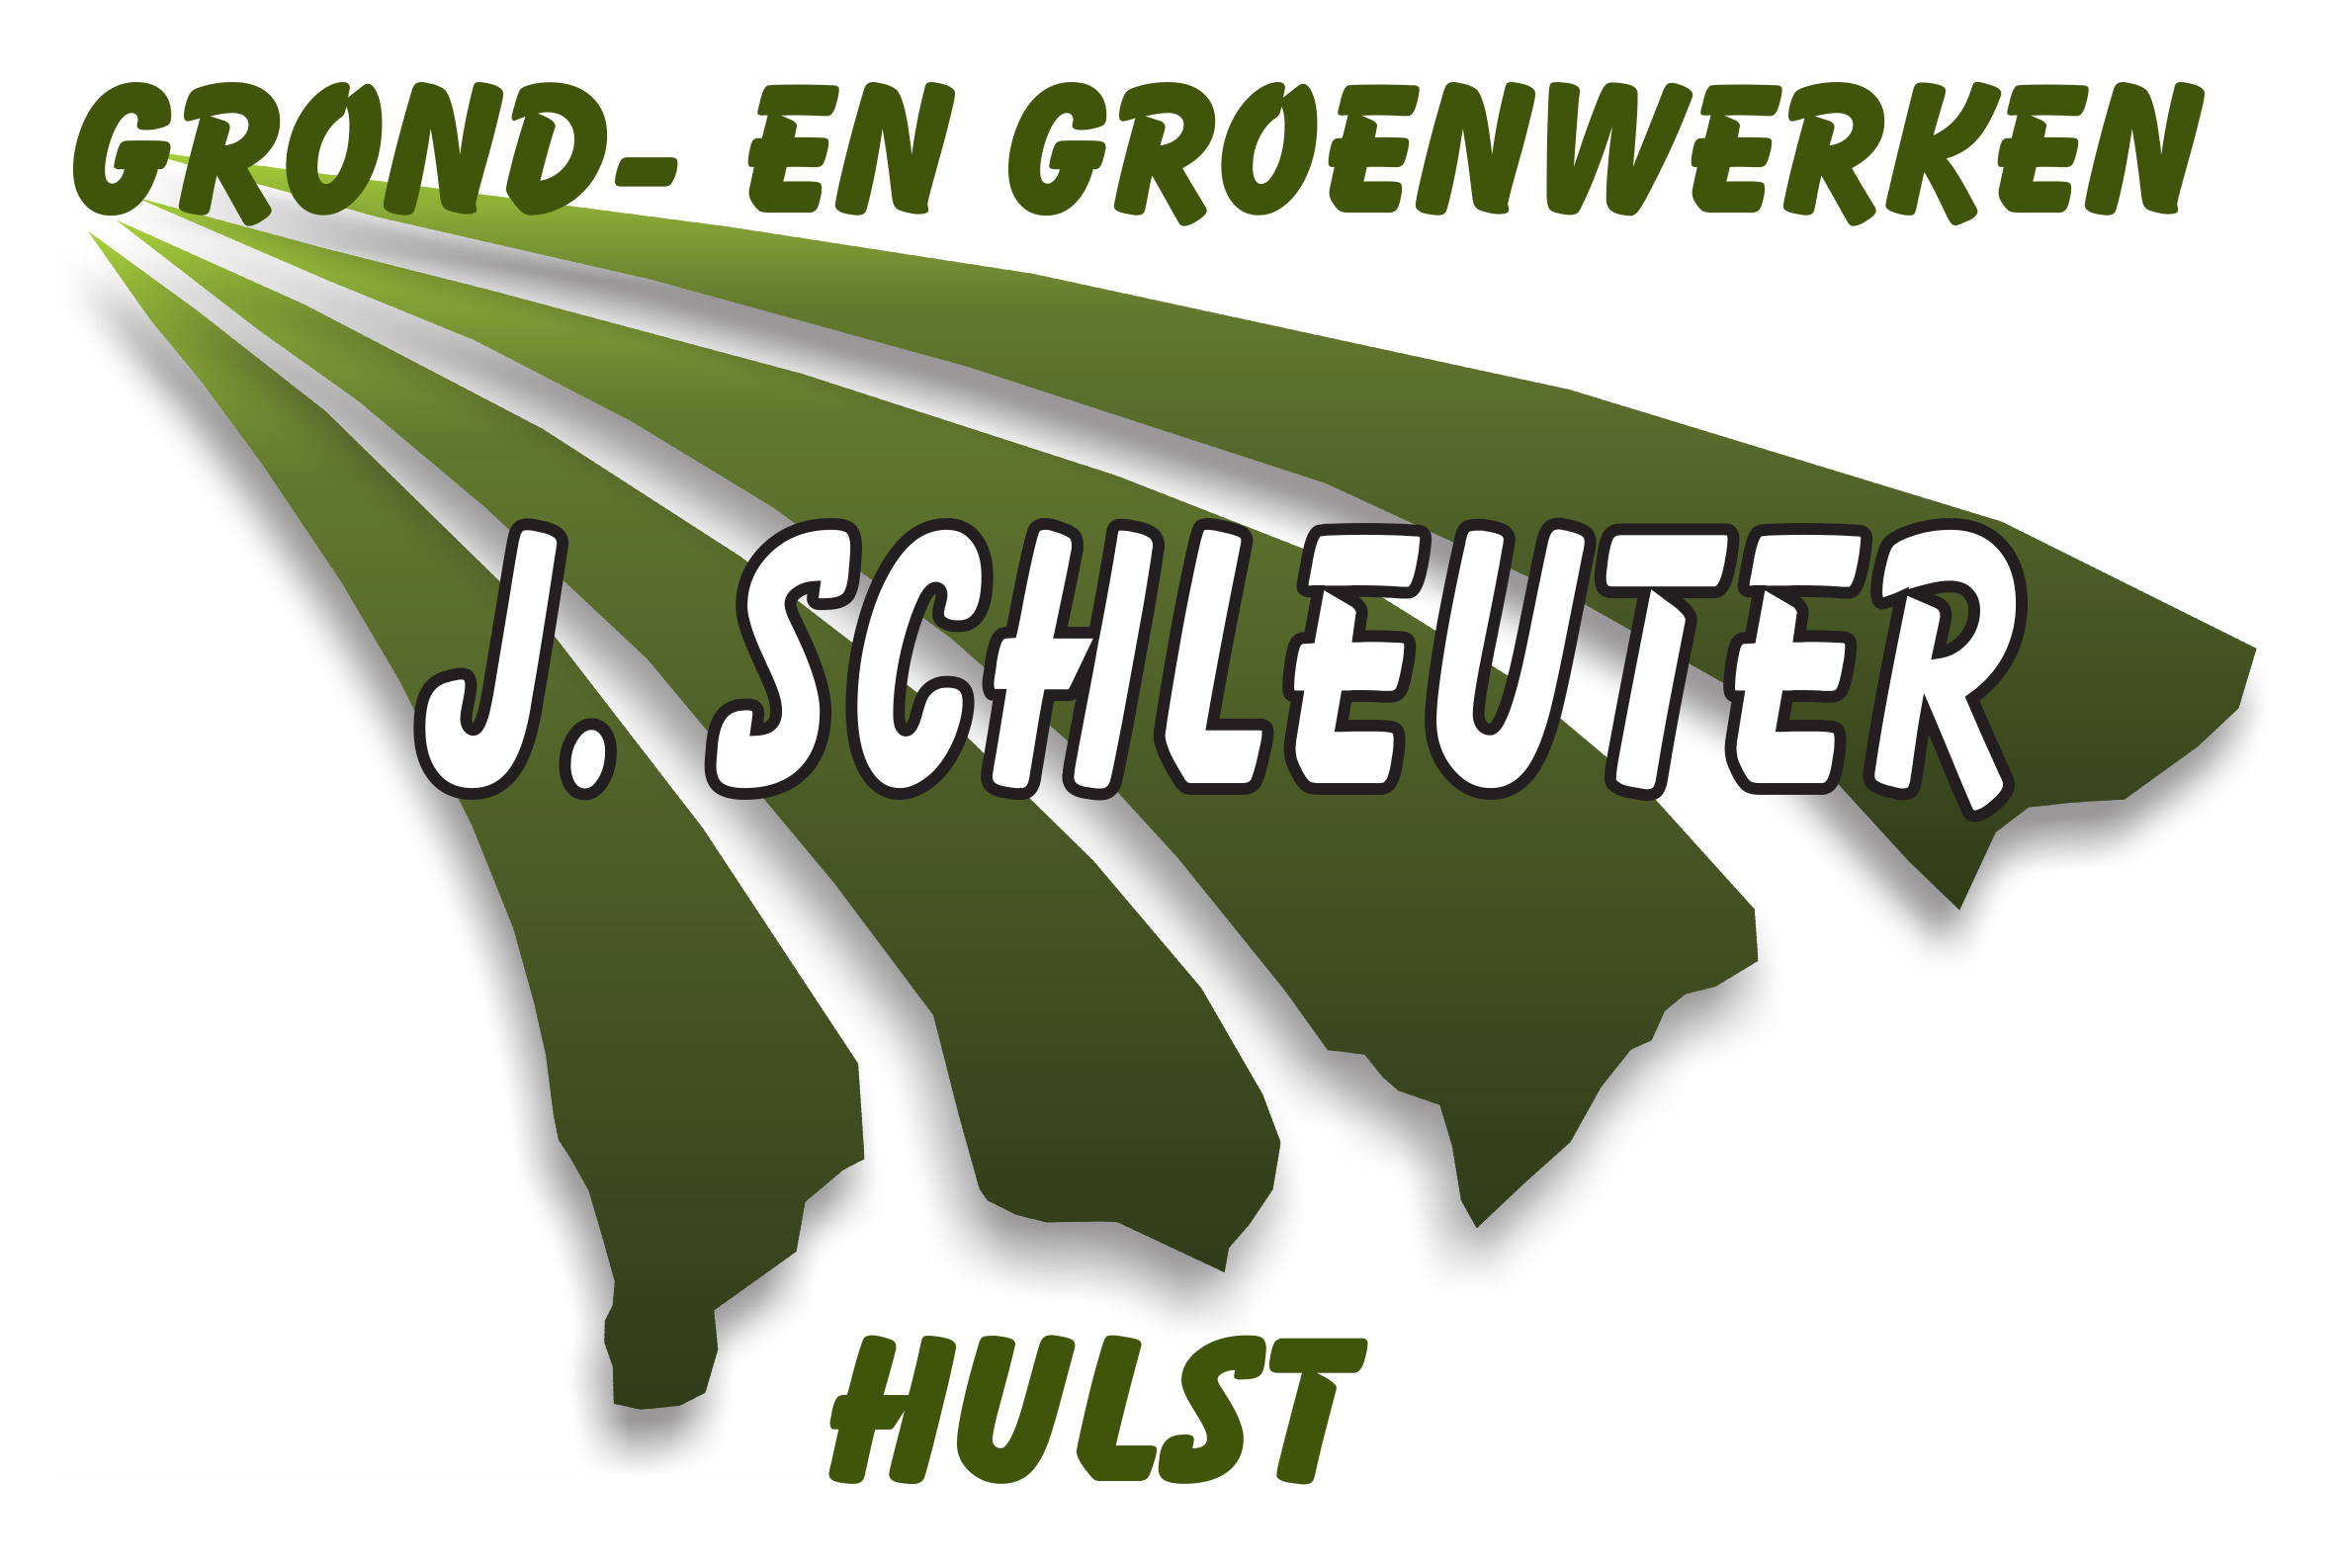 Grond- en Groenwerken J. Schleuter Logo